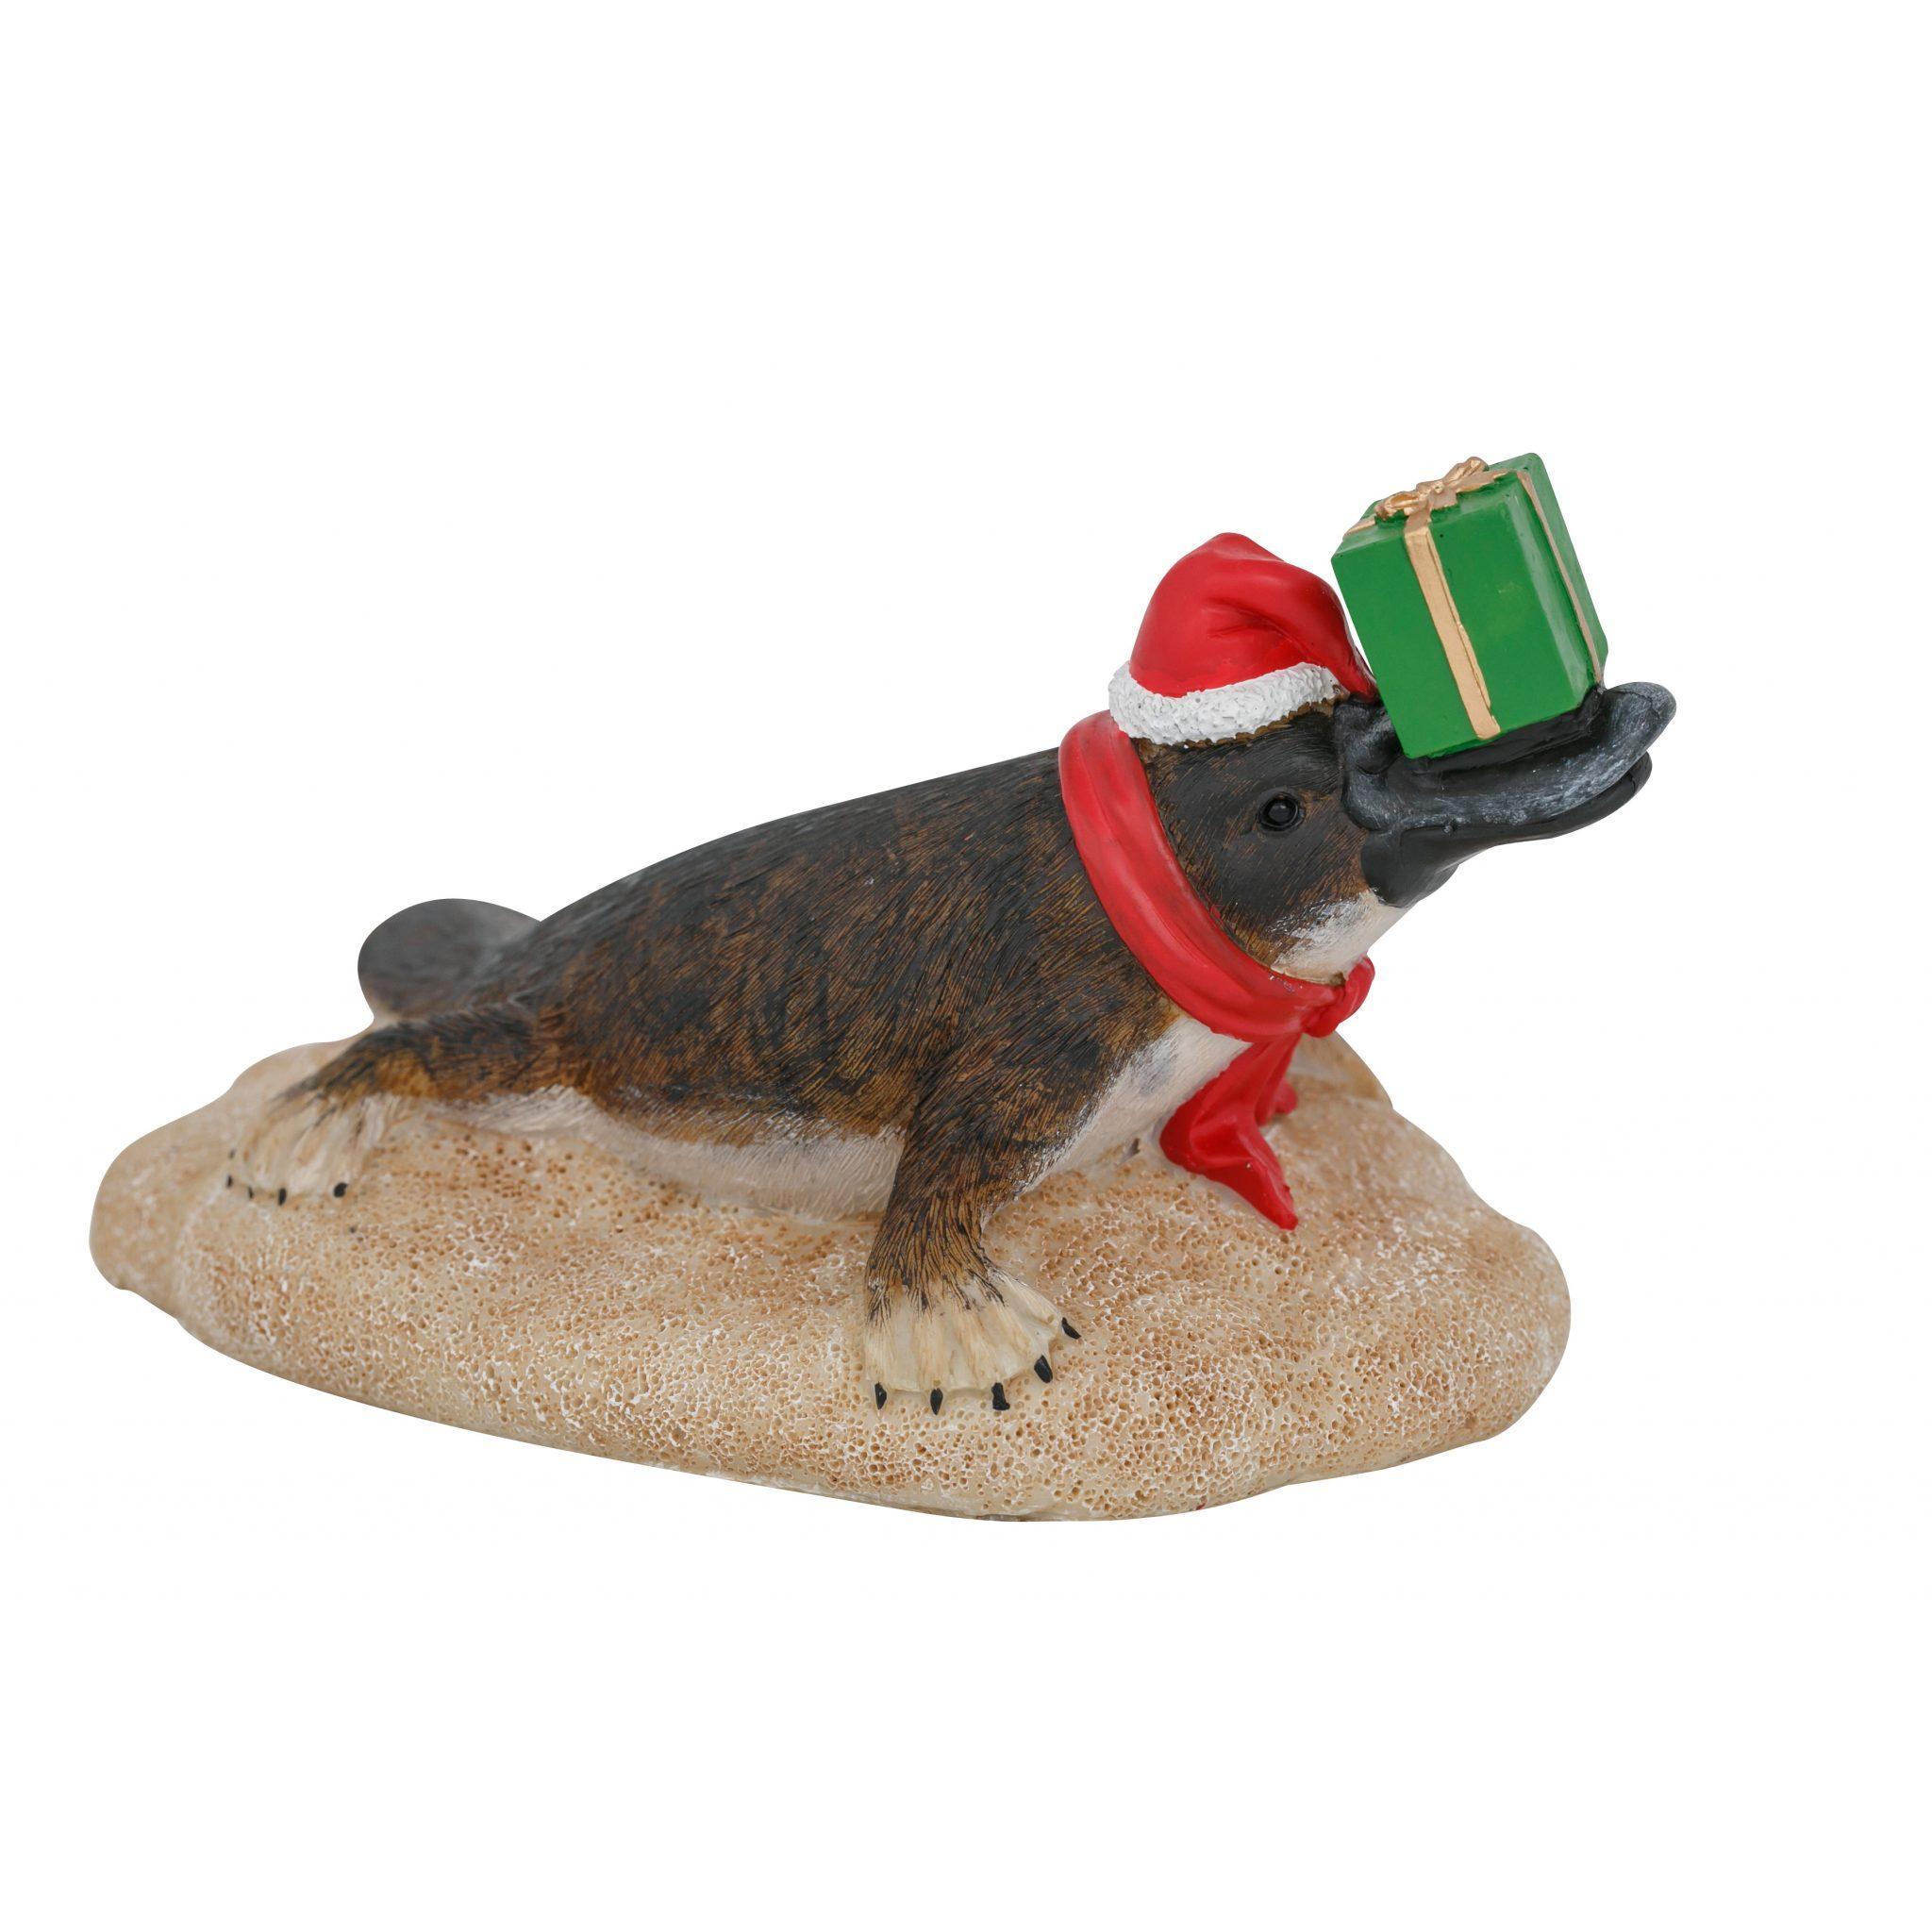 Platypus Christmas Figure Present 15cm